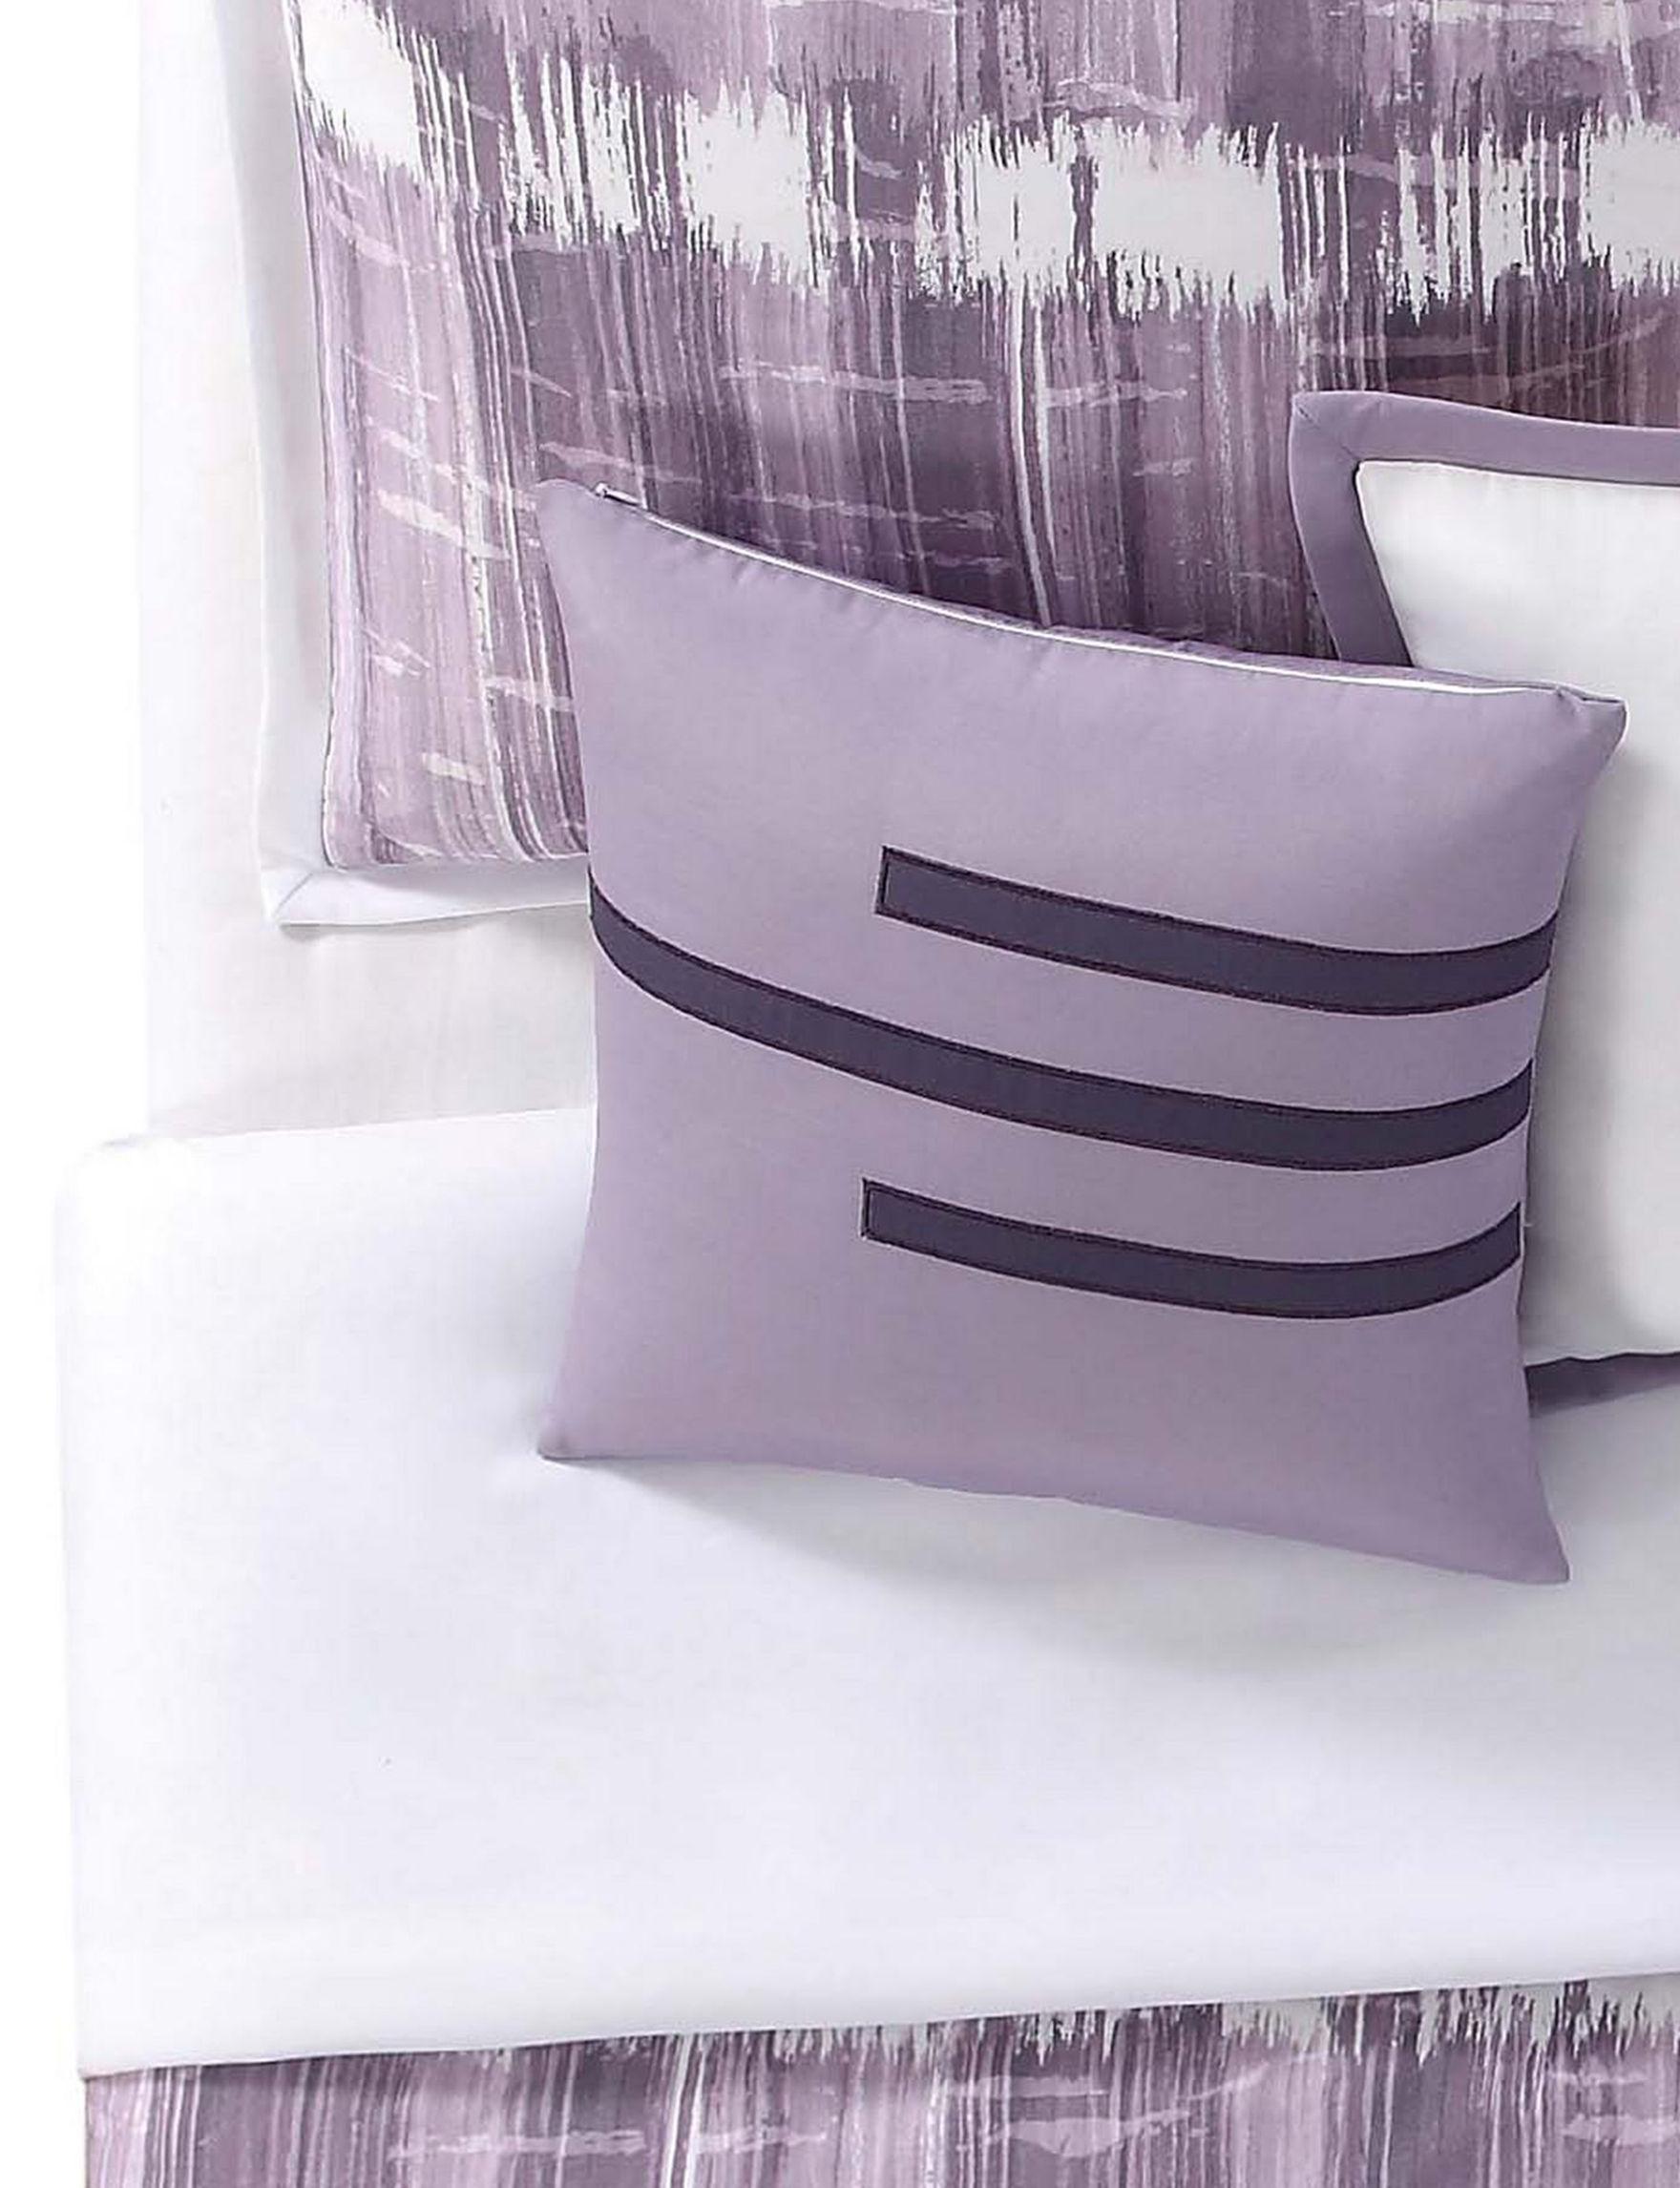 Vince Camuto Purple Decorative Pillows